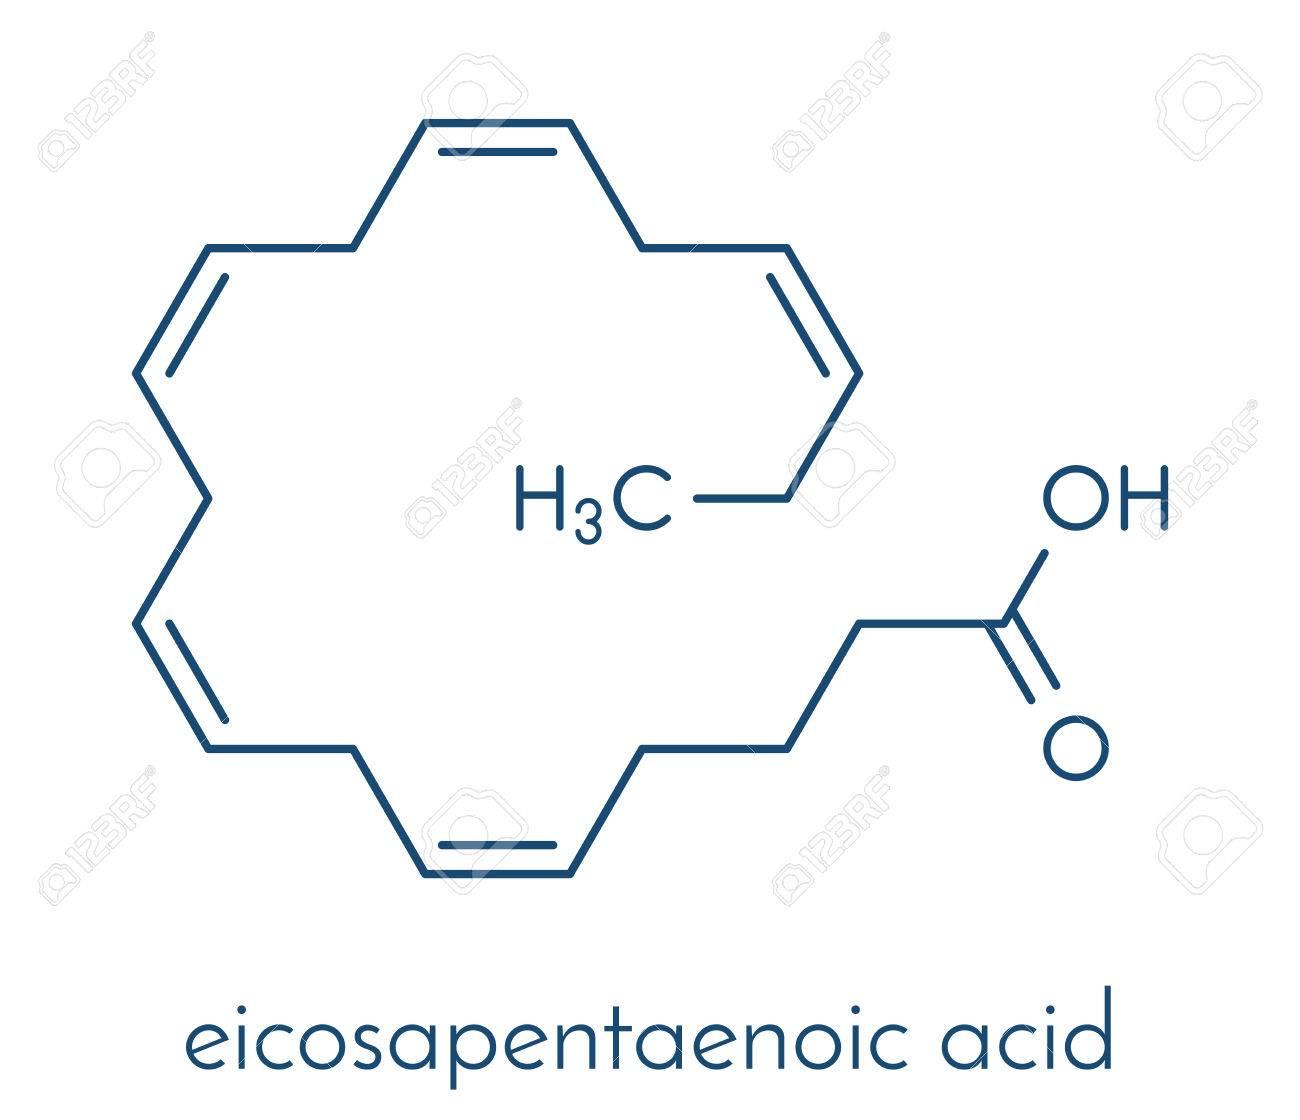 Eicasapentaenoic acid epa timnodonic acid molecule eicasapentaenoic acid epa timnodonic acid molecule polyunsaturated omega 3 fatty acid pooptronica